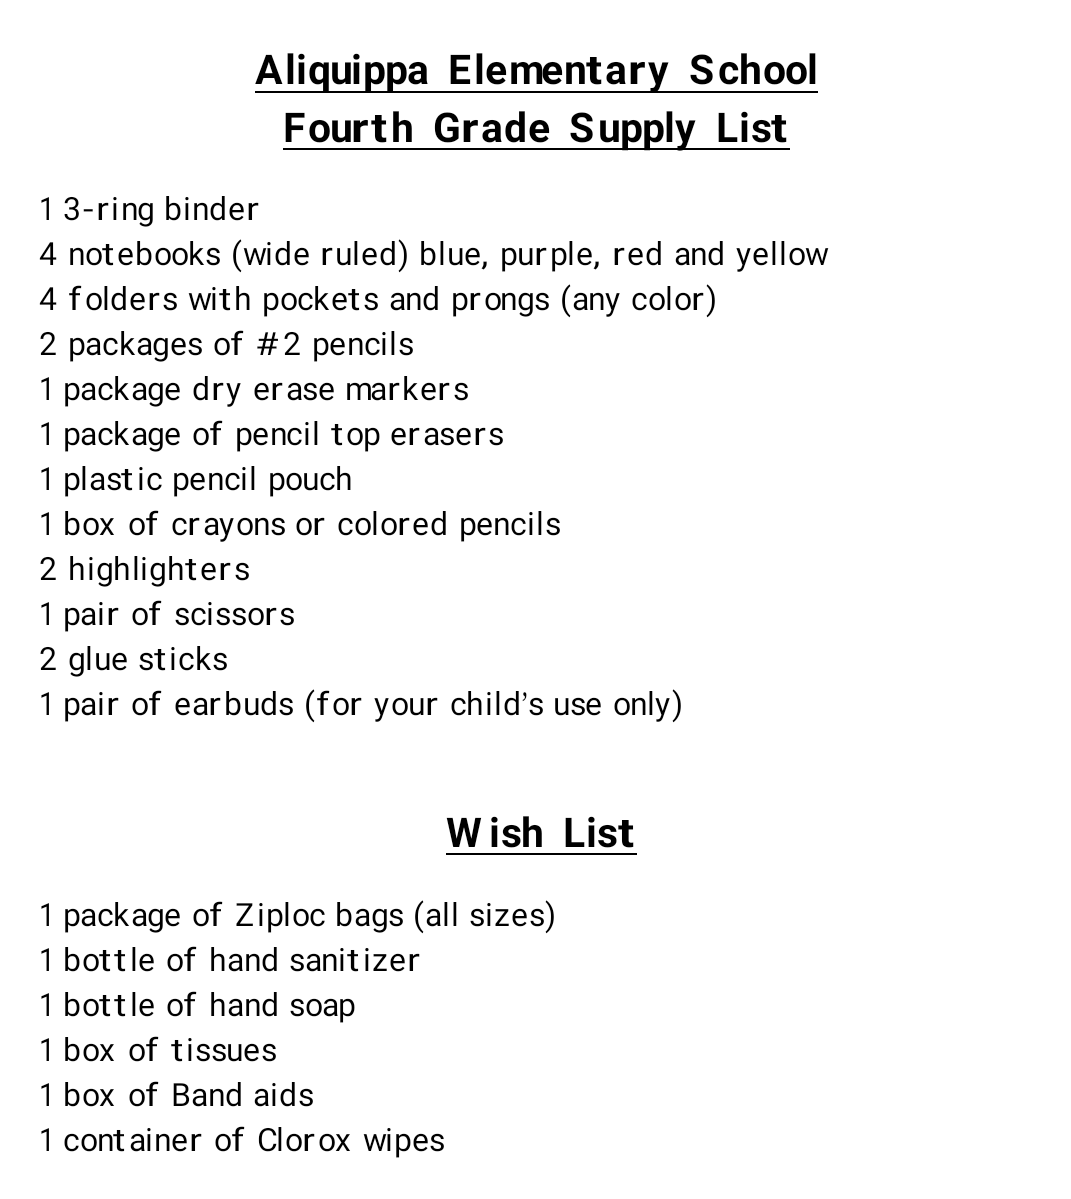 AES 4th Grade Supply List